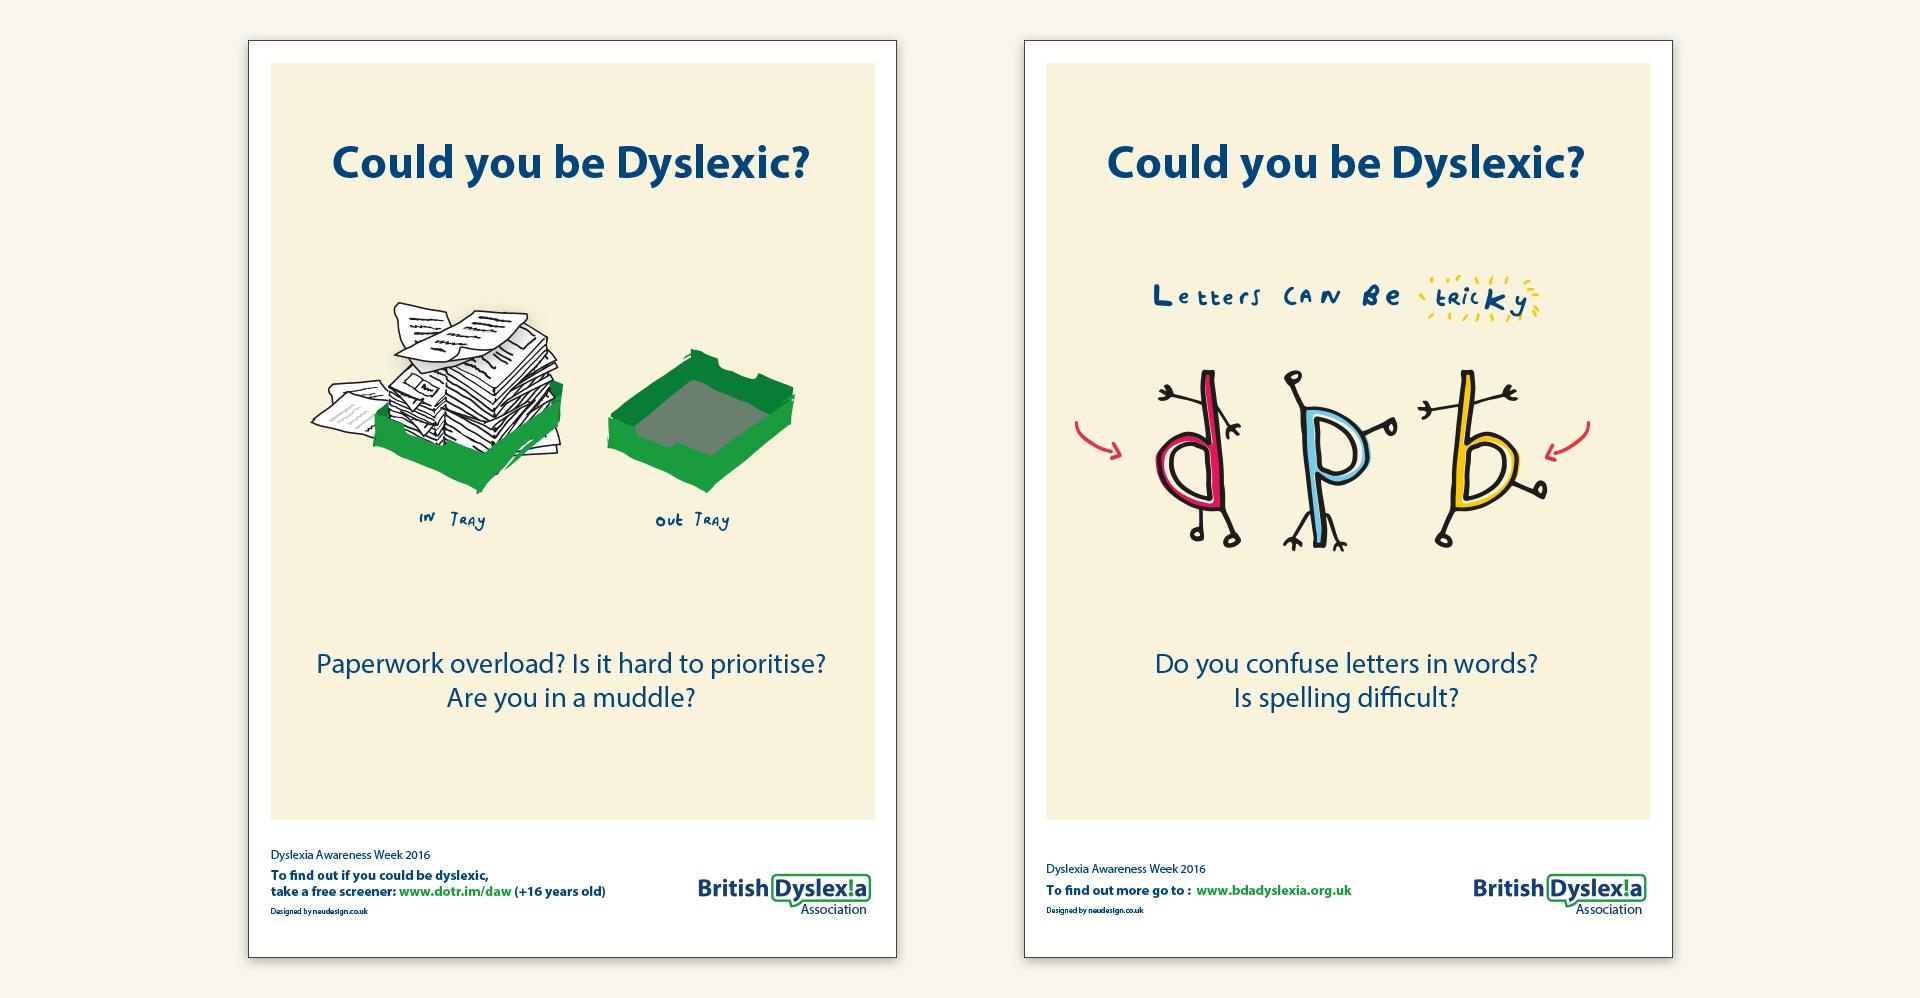 Dyslexia Awareness Campaign Upcoming >> British Dyslexia Association Neudesign